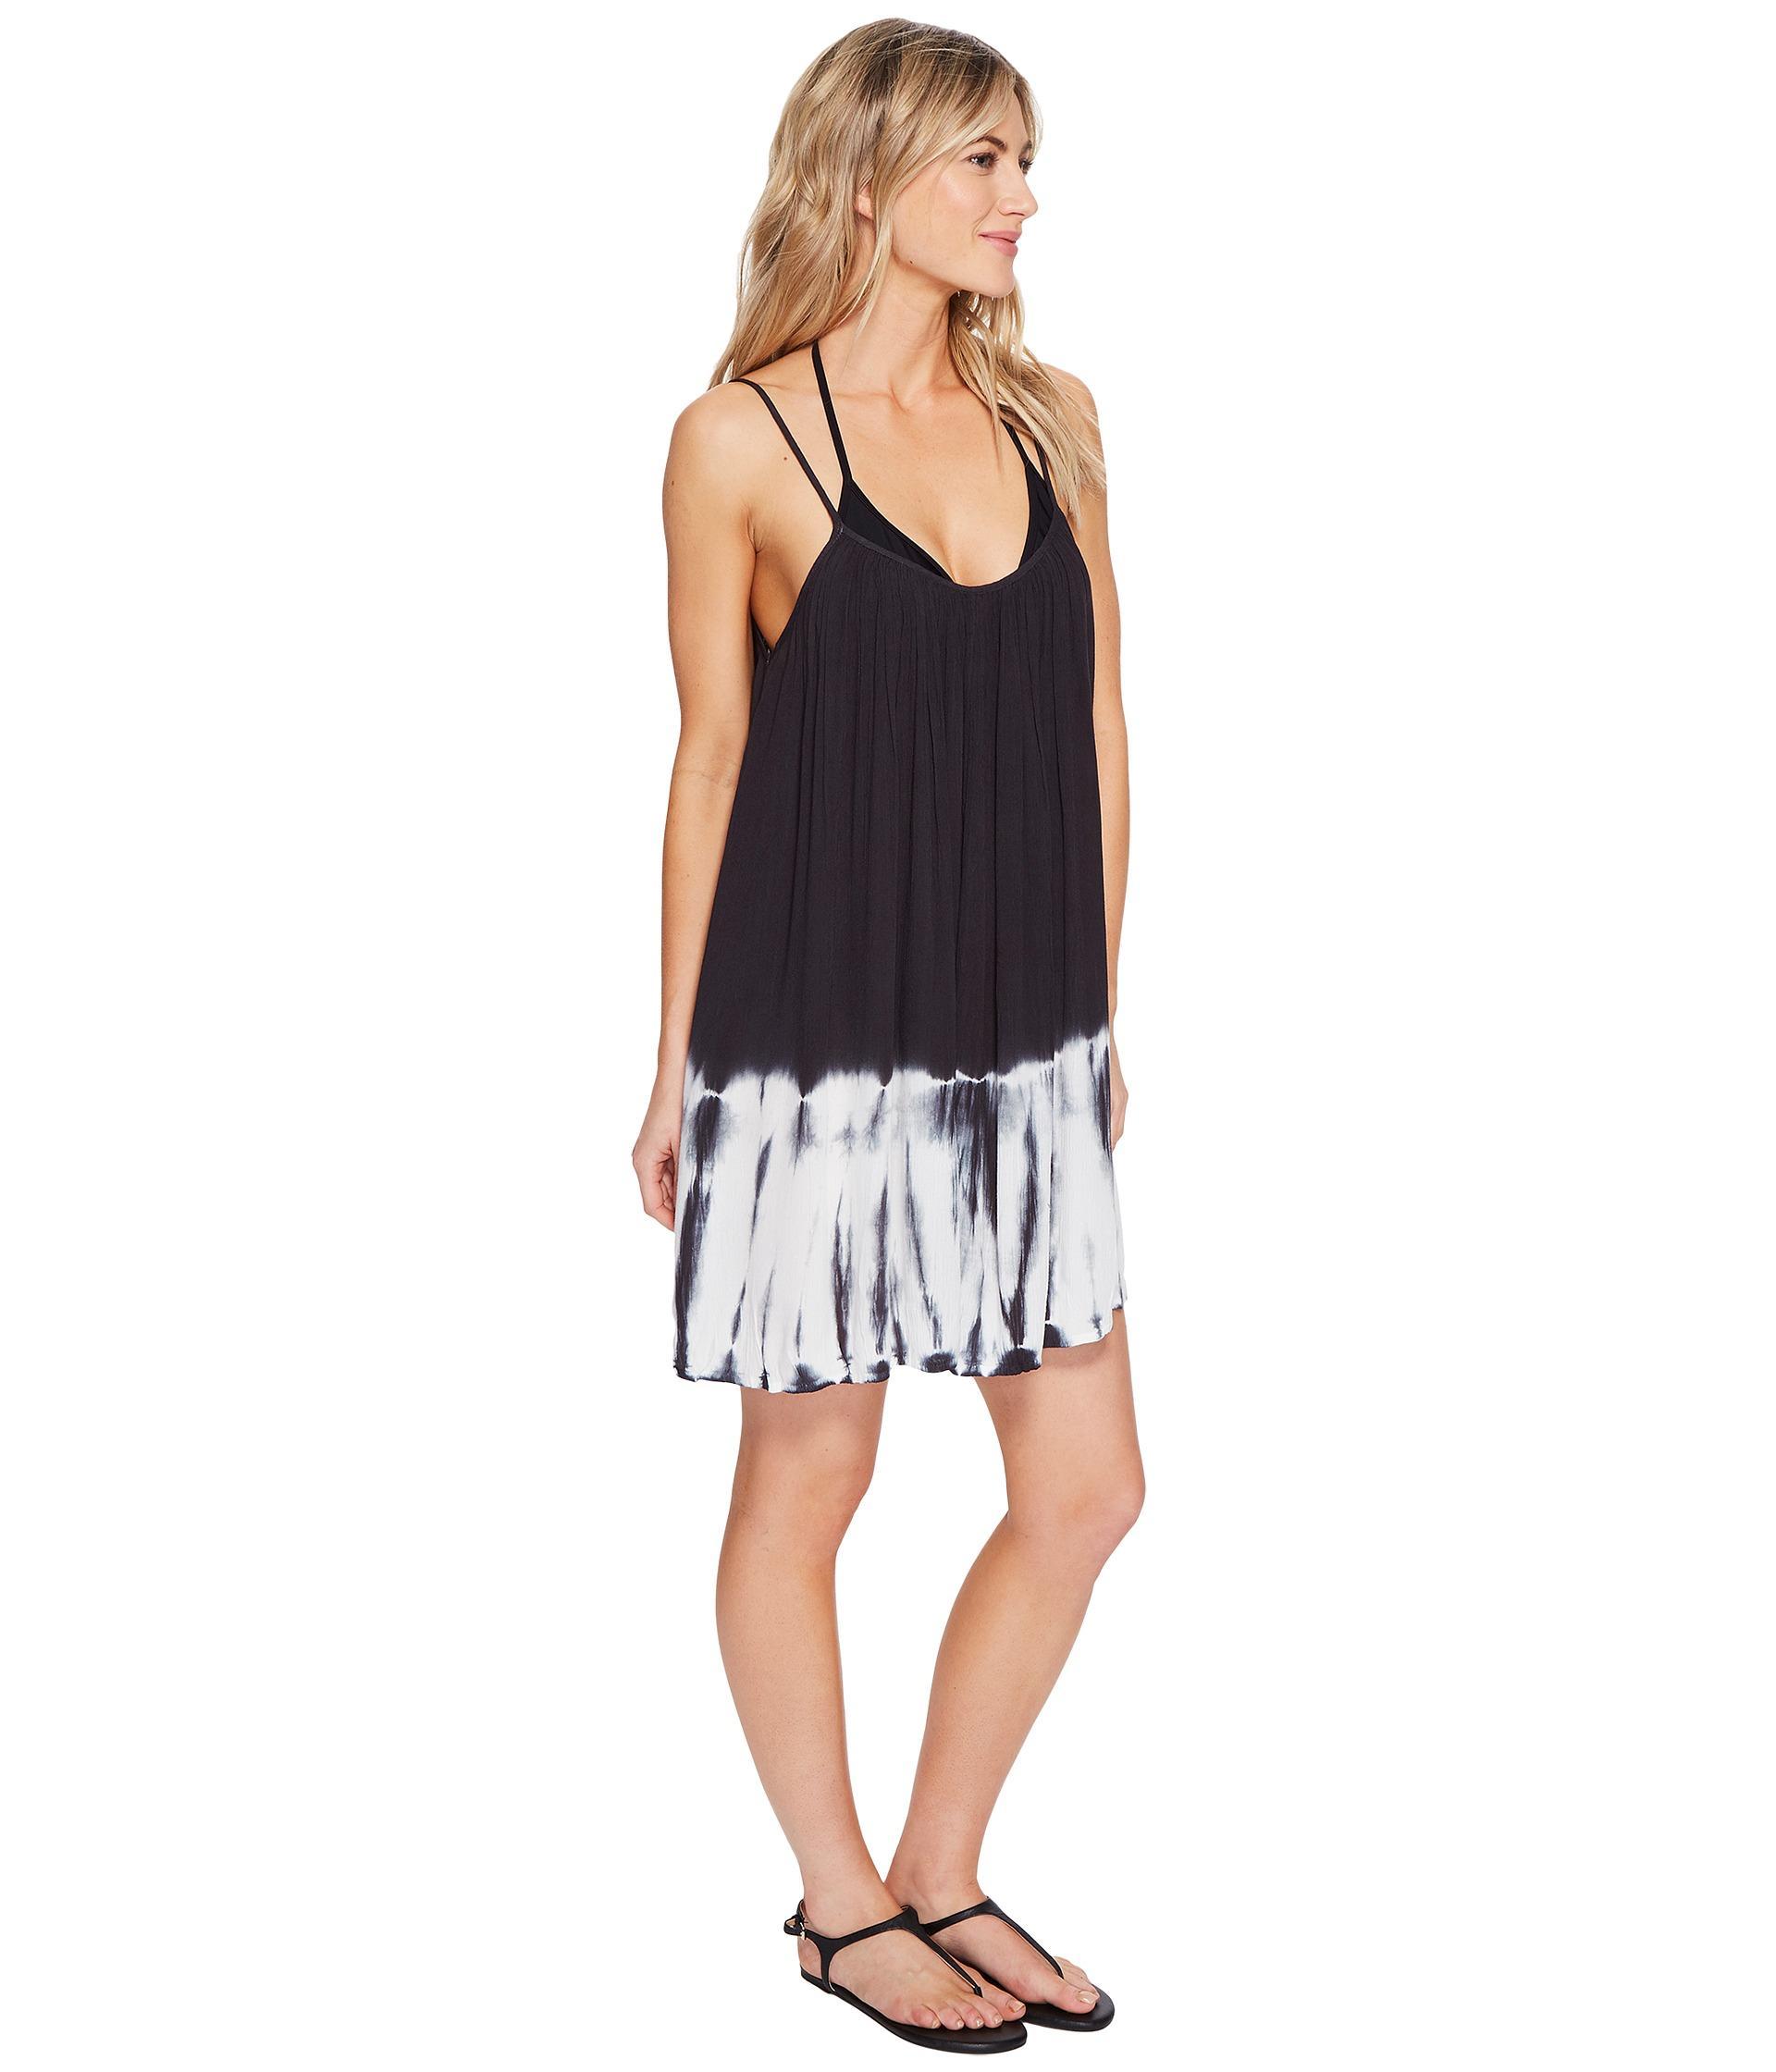 dfad4c572e Billabong Beach Cruise Dress Cover-up in Black - Lyst